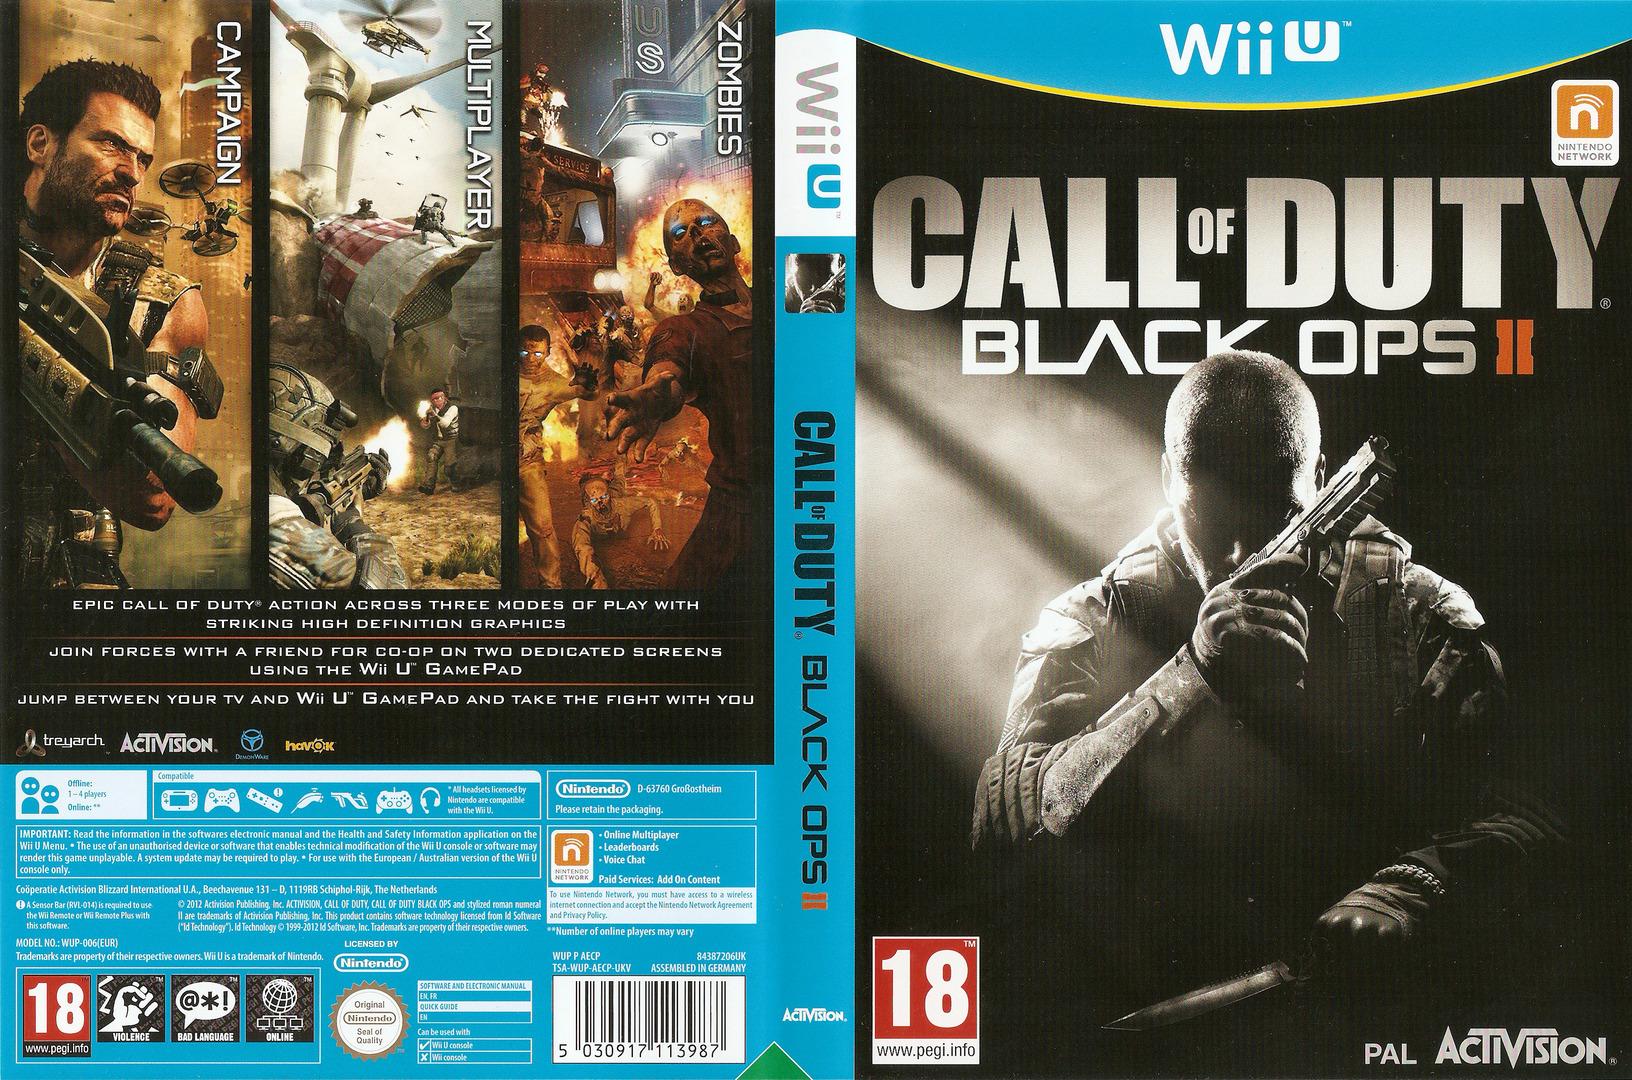 http://art.gametdb.com/wiiu/coverfullHQ/EN/AECP52.jpg